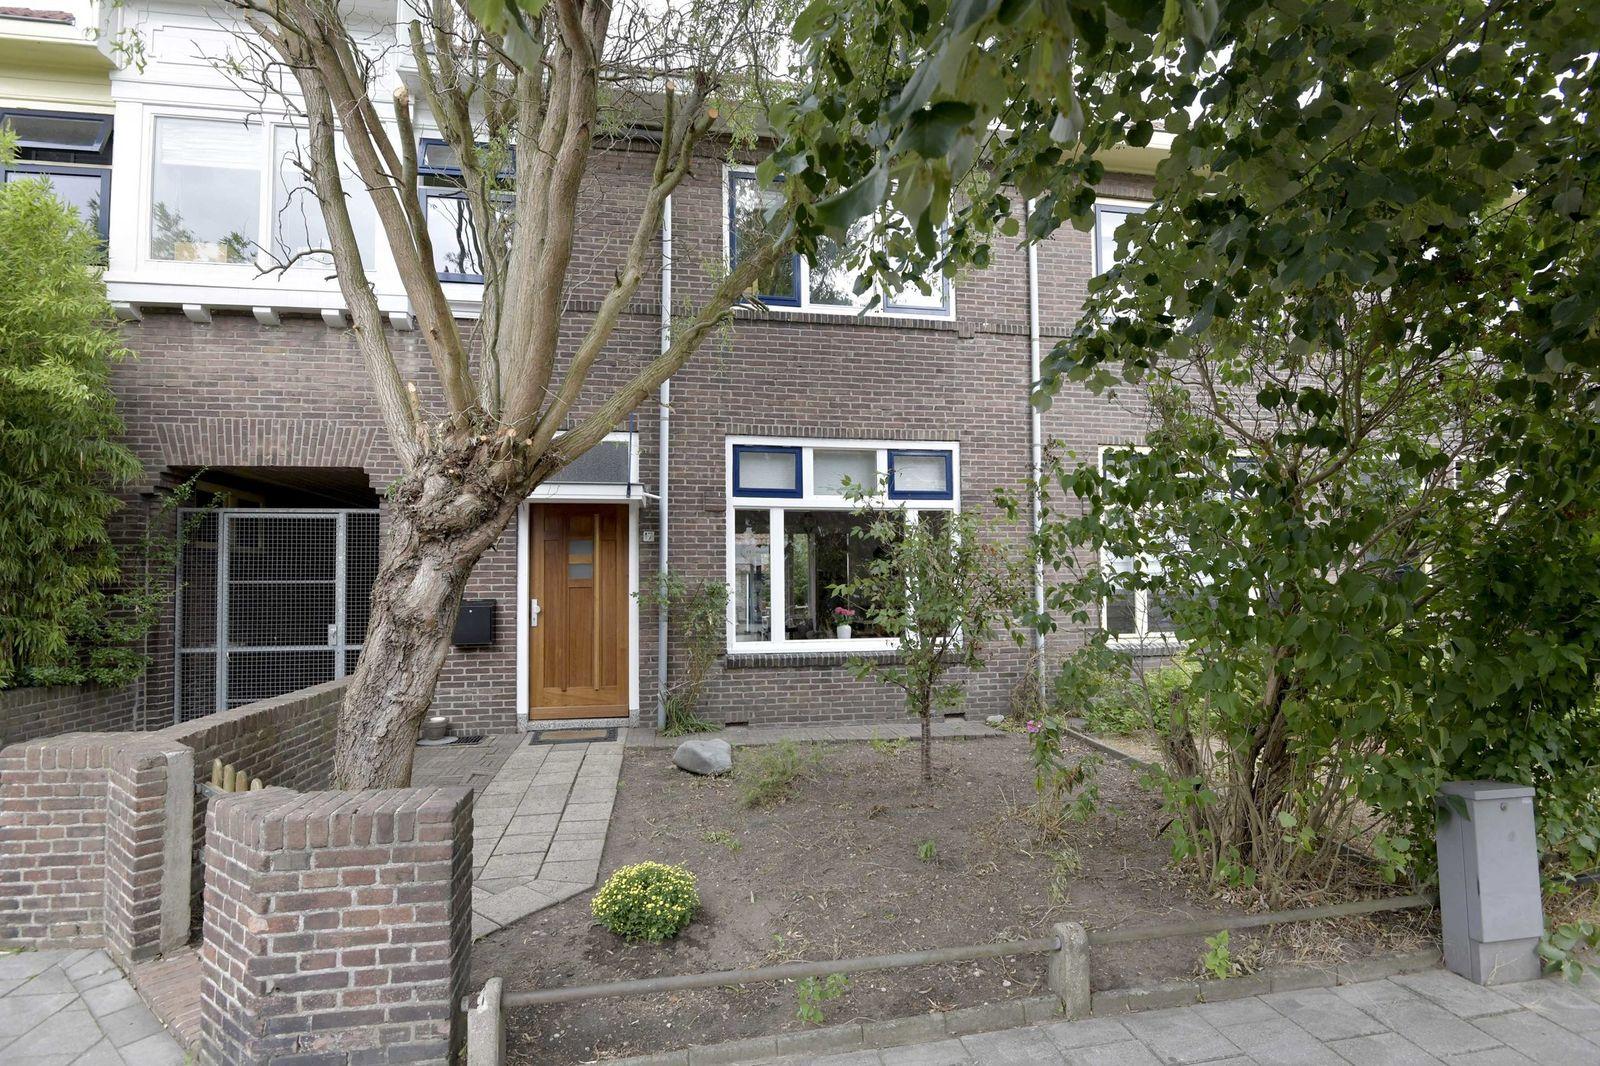 Veenweg 17, Deventer